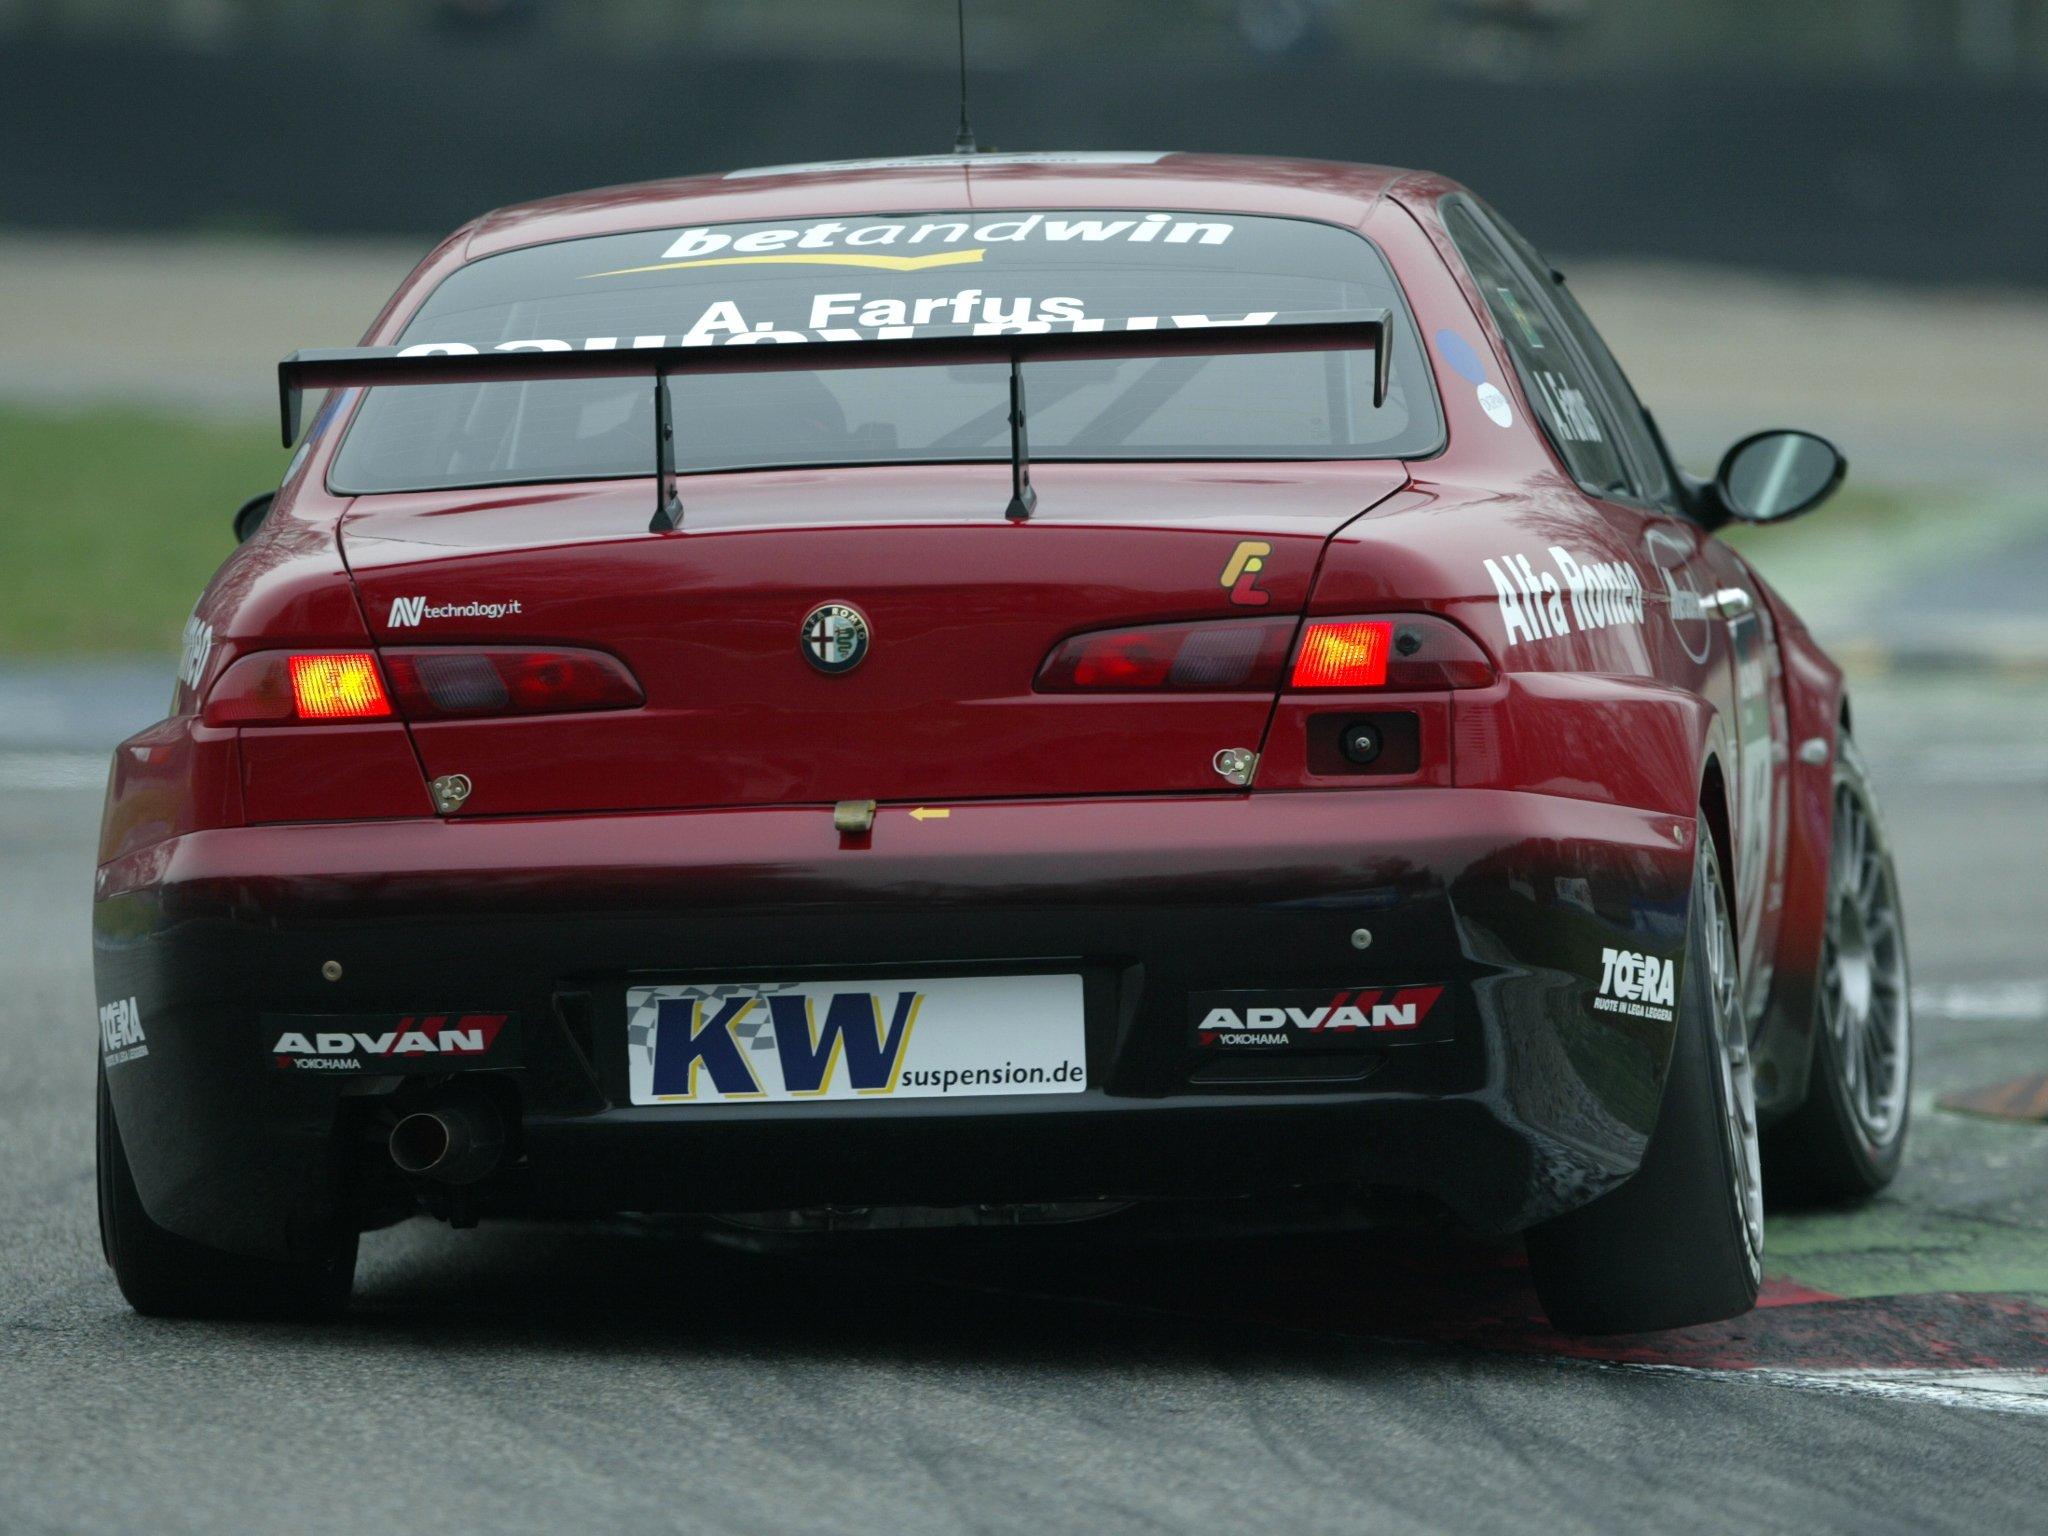 Race Car Wallpaper Images 2004 07 Alfa Romeo 156 Super 2000 Se107 Wtcc Race Racing